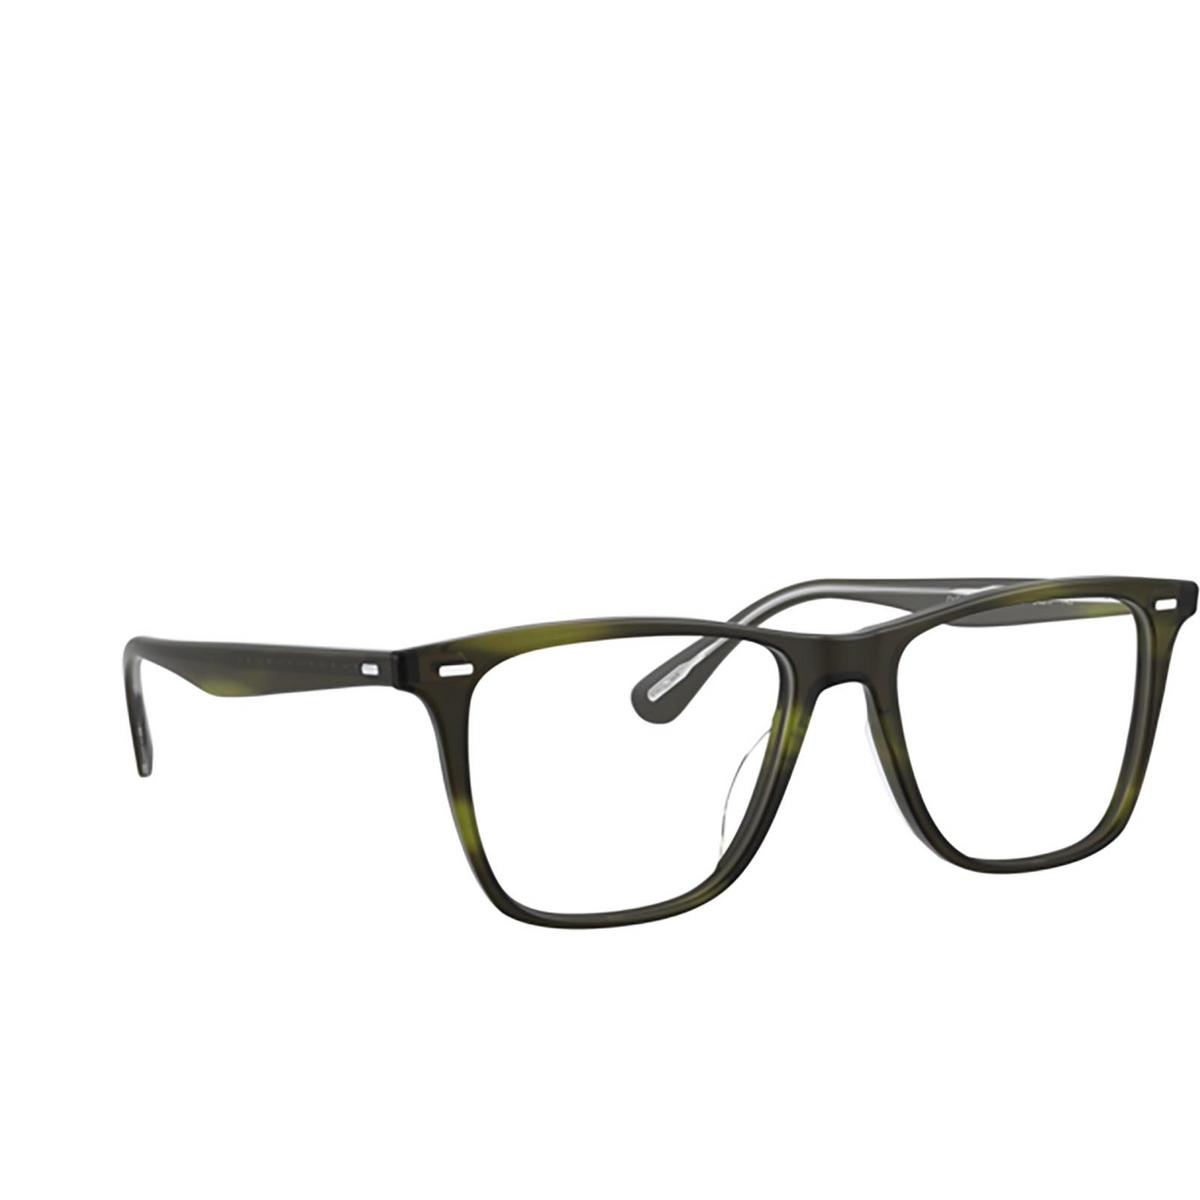 Oliver Peoples® Square Eyeglasses: Ollis OV5437U color Semi Matte Emerald Bark 1693 - three-quarters view.